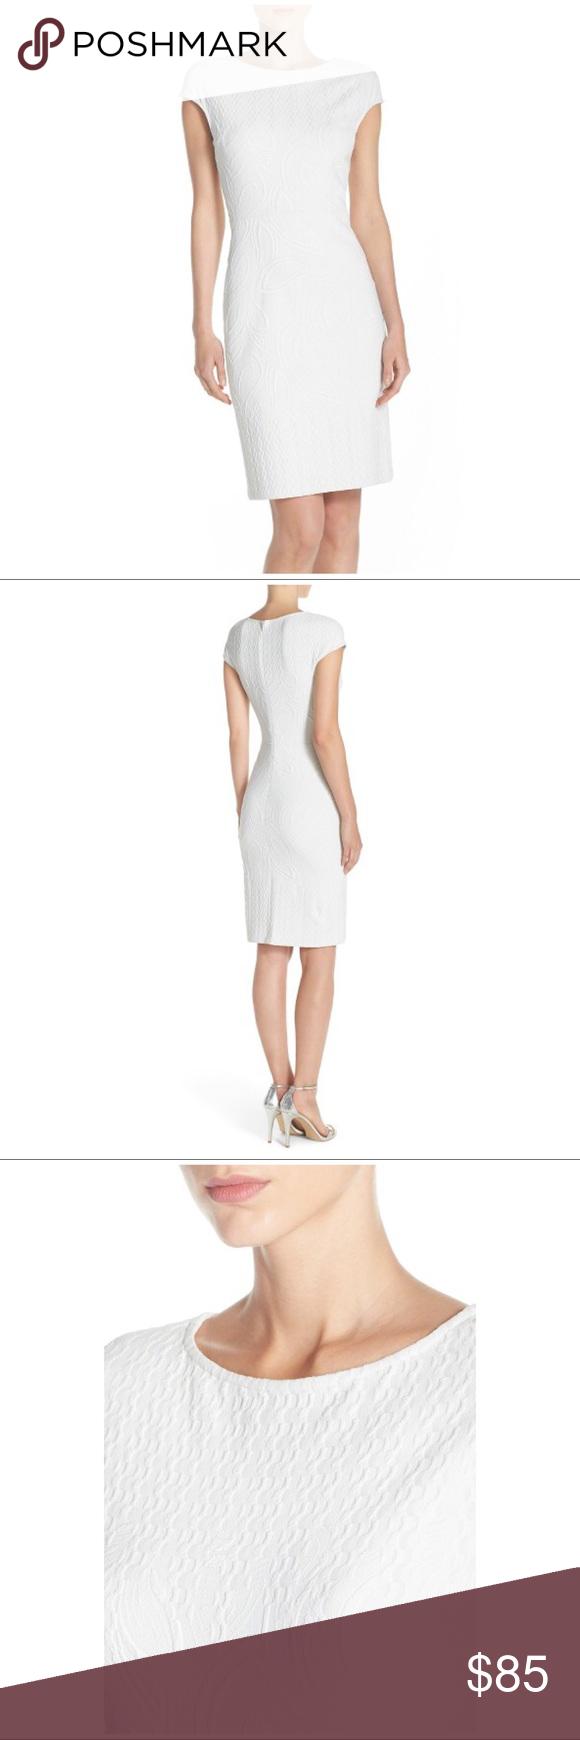 Julia jordan white jacquard sheath dress nwt monochrome hand